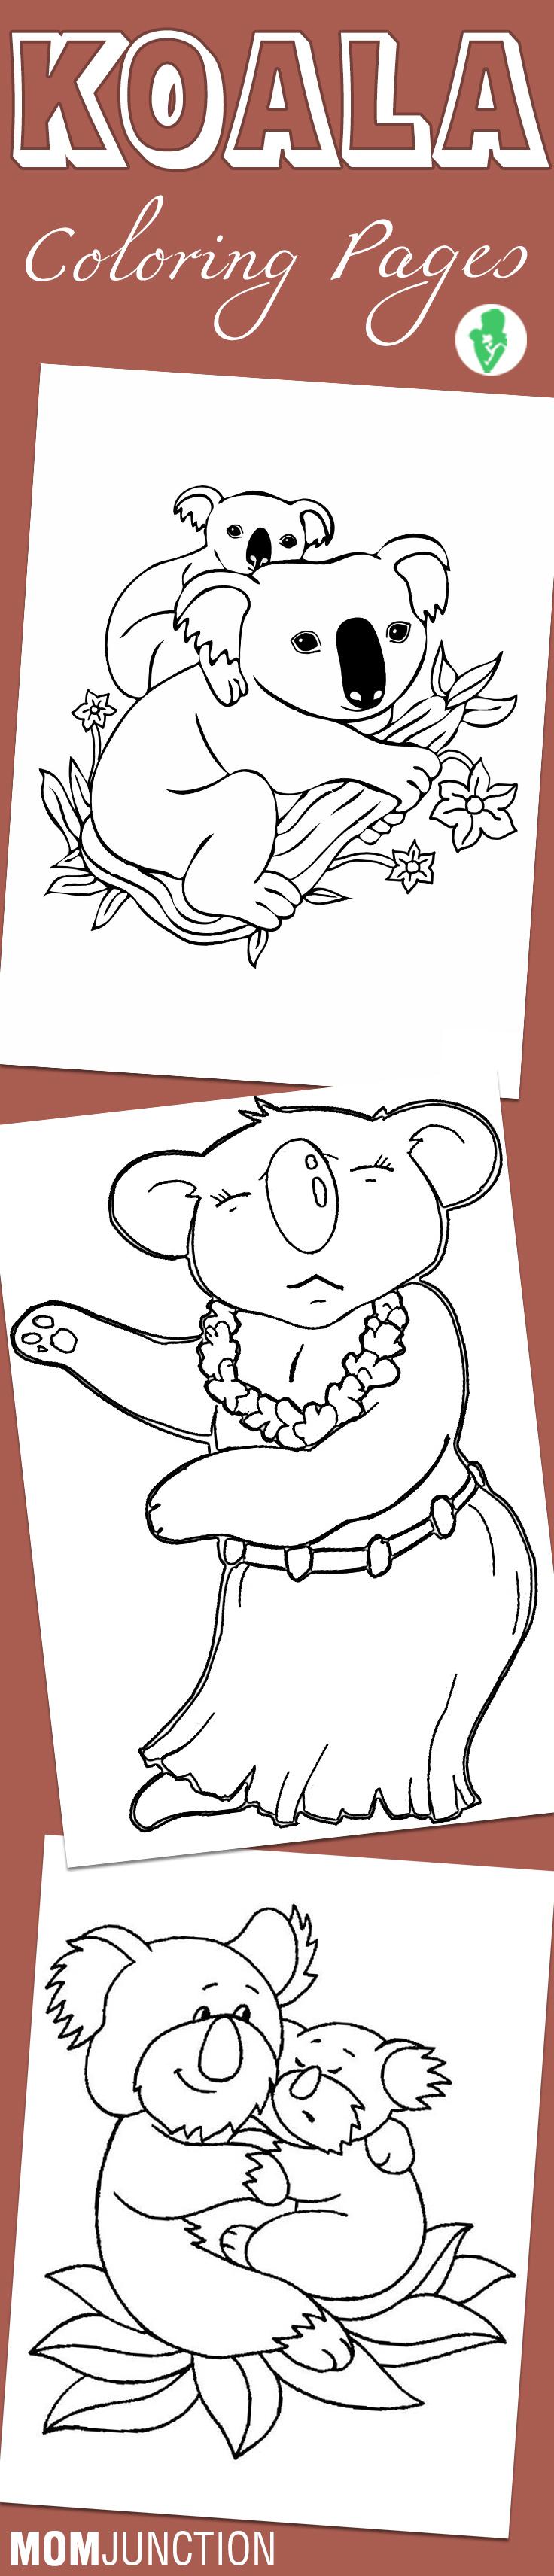 Koala Coloring Pages Free Printables